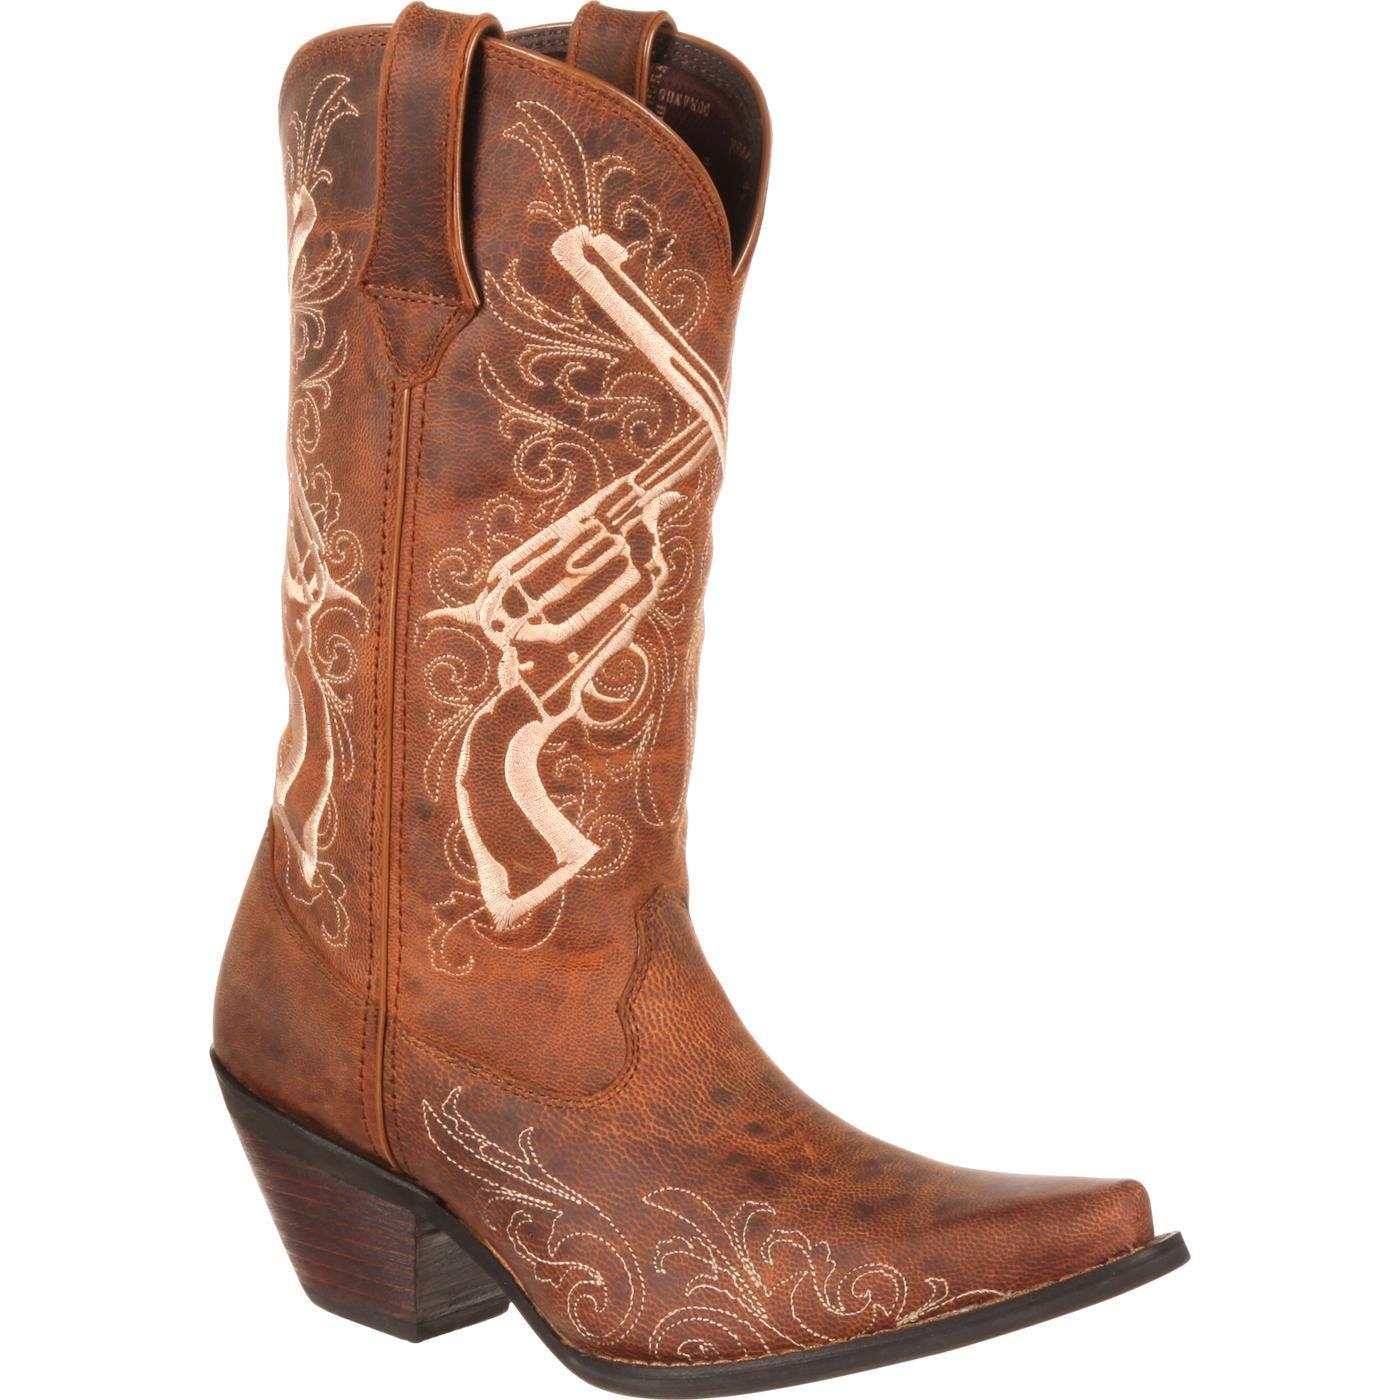 Crush™ by Durango® Women's Crossed Guns Western Boot Tan